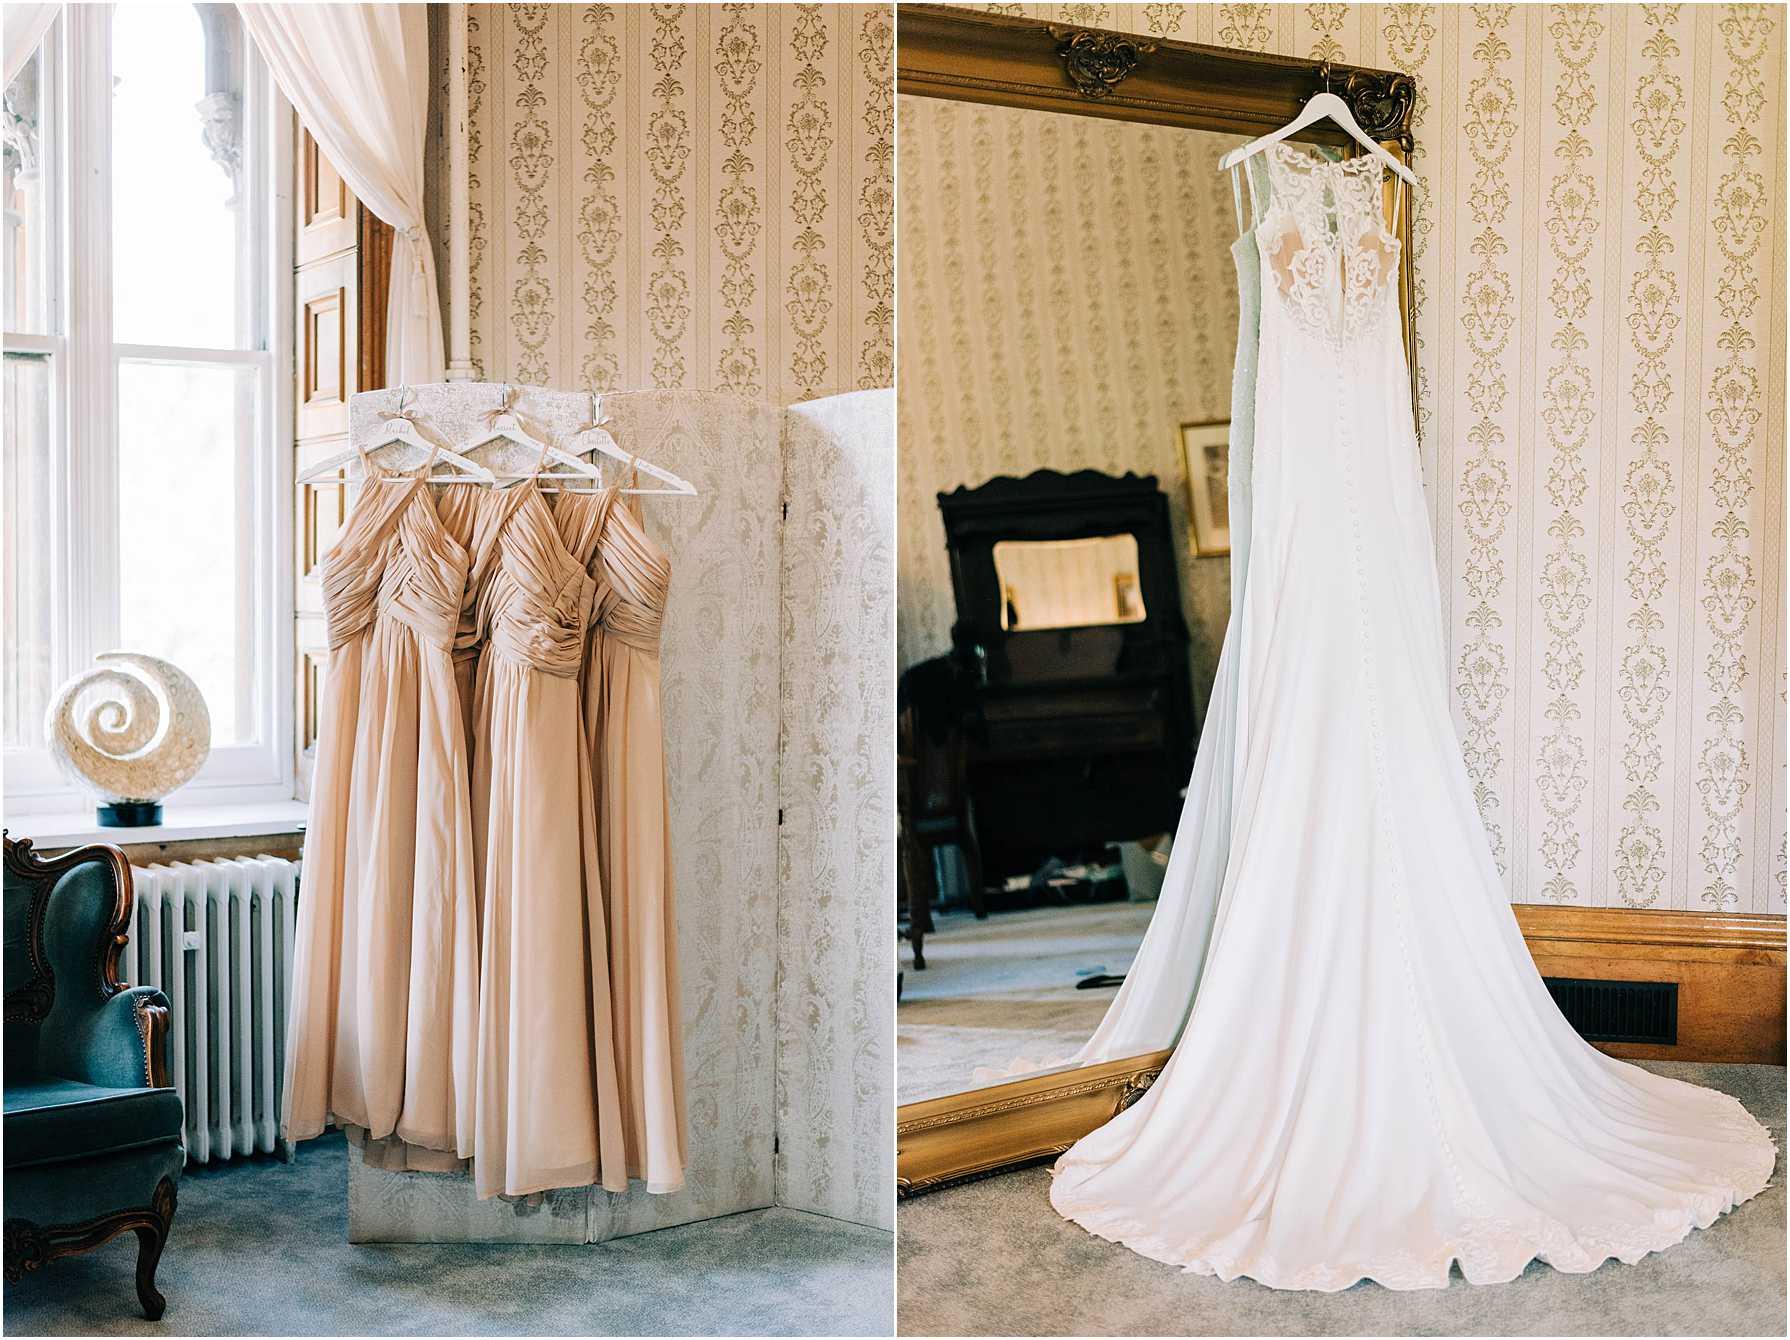 wedding dress hanging on a big mirror